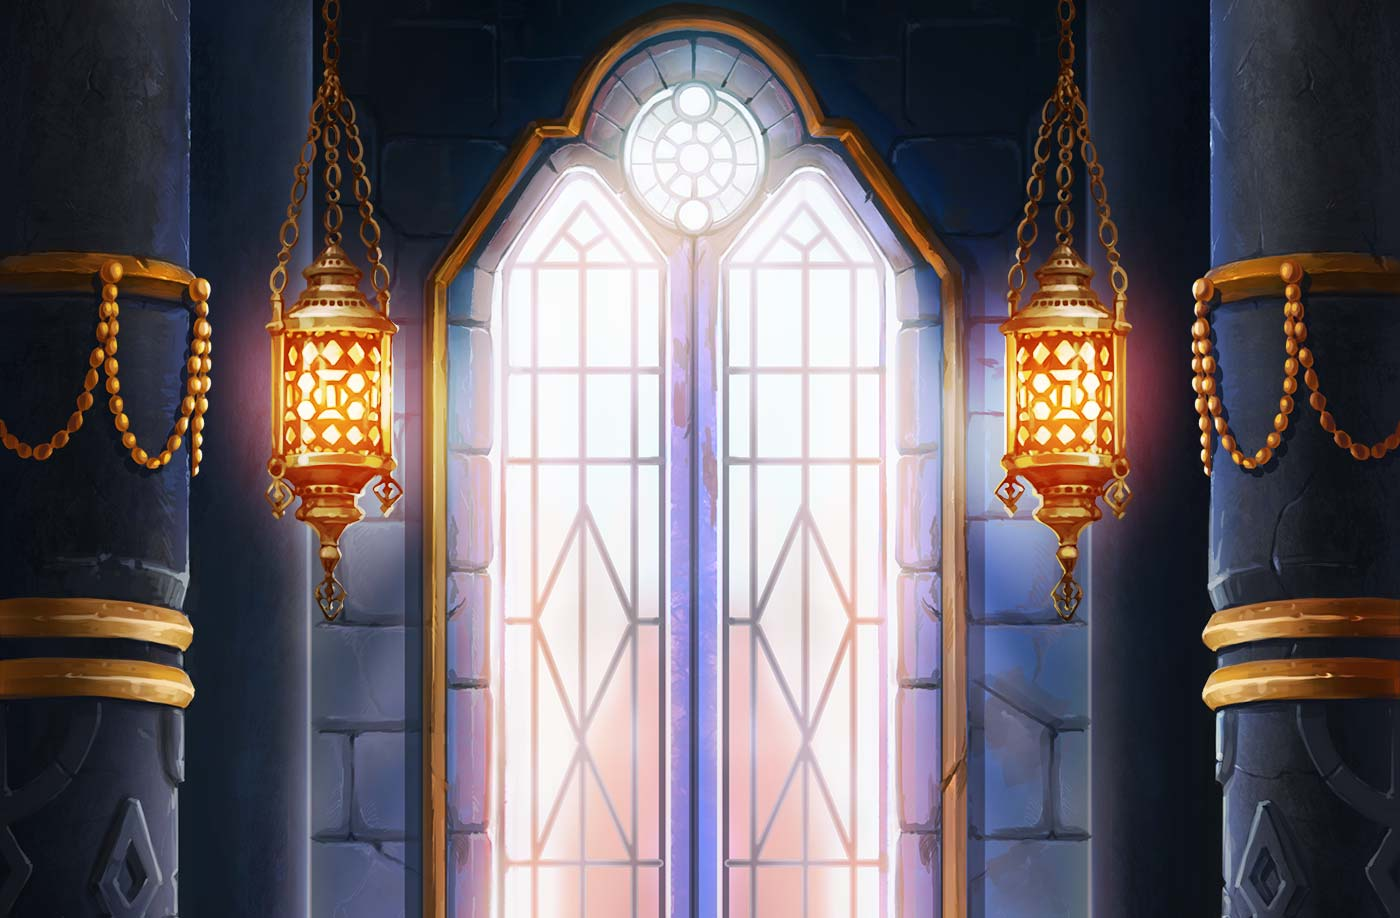 2D Game Characters • Kingdoms At War